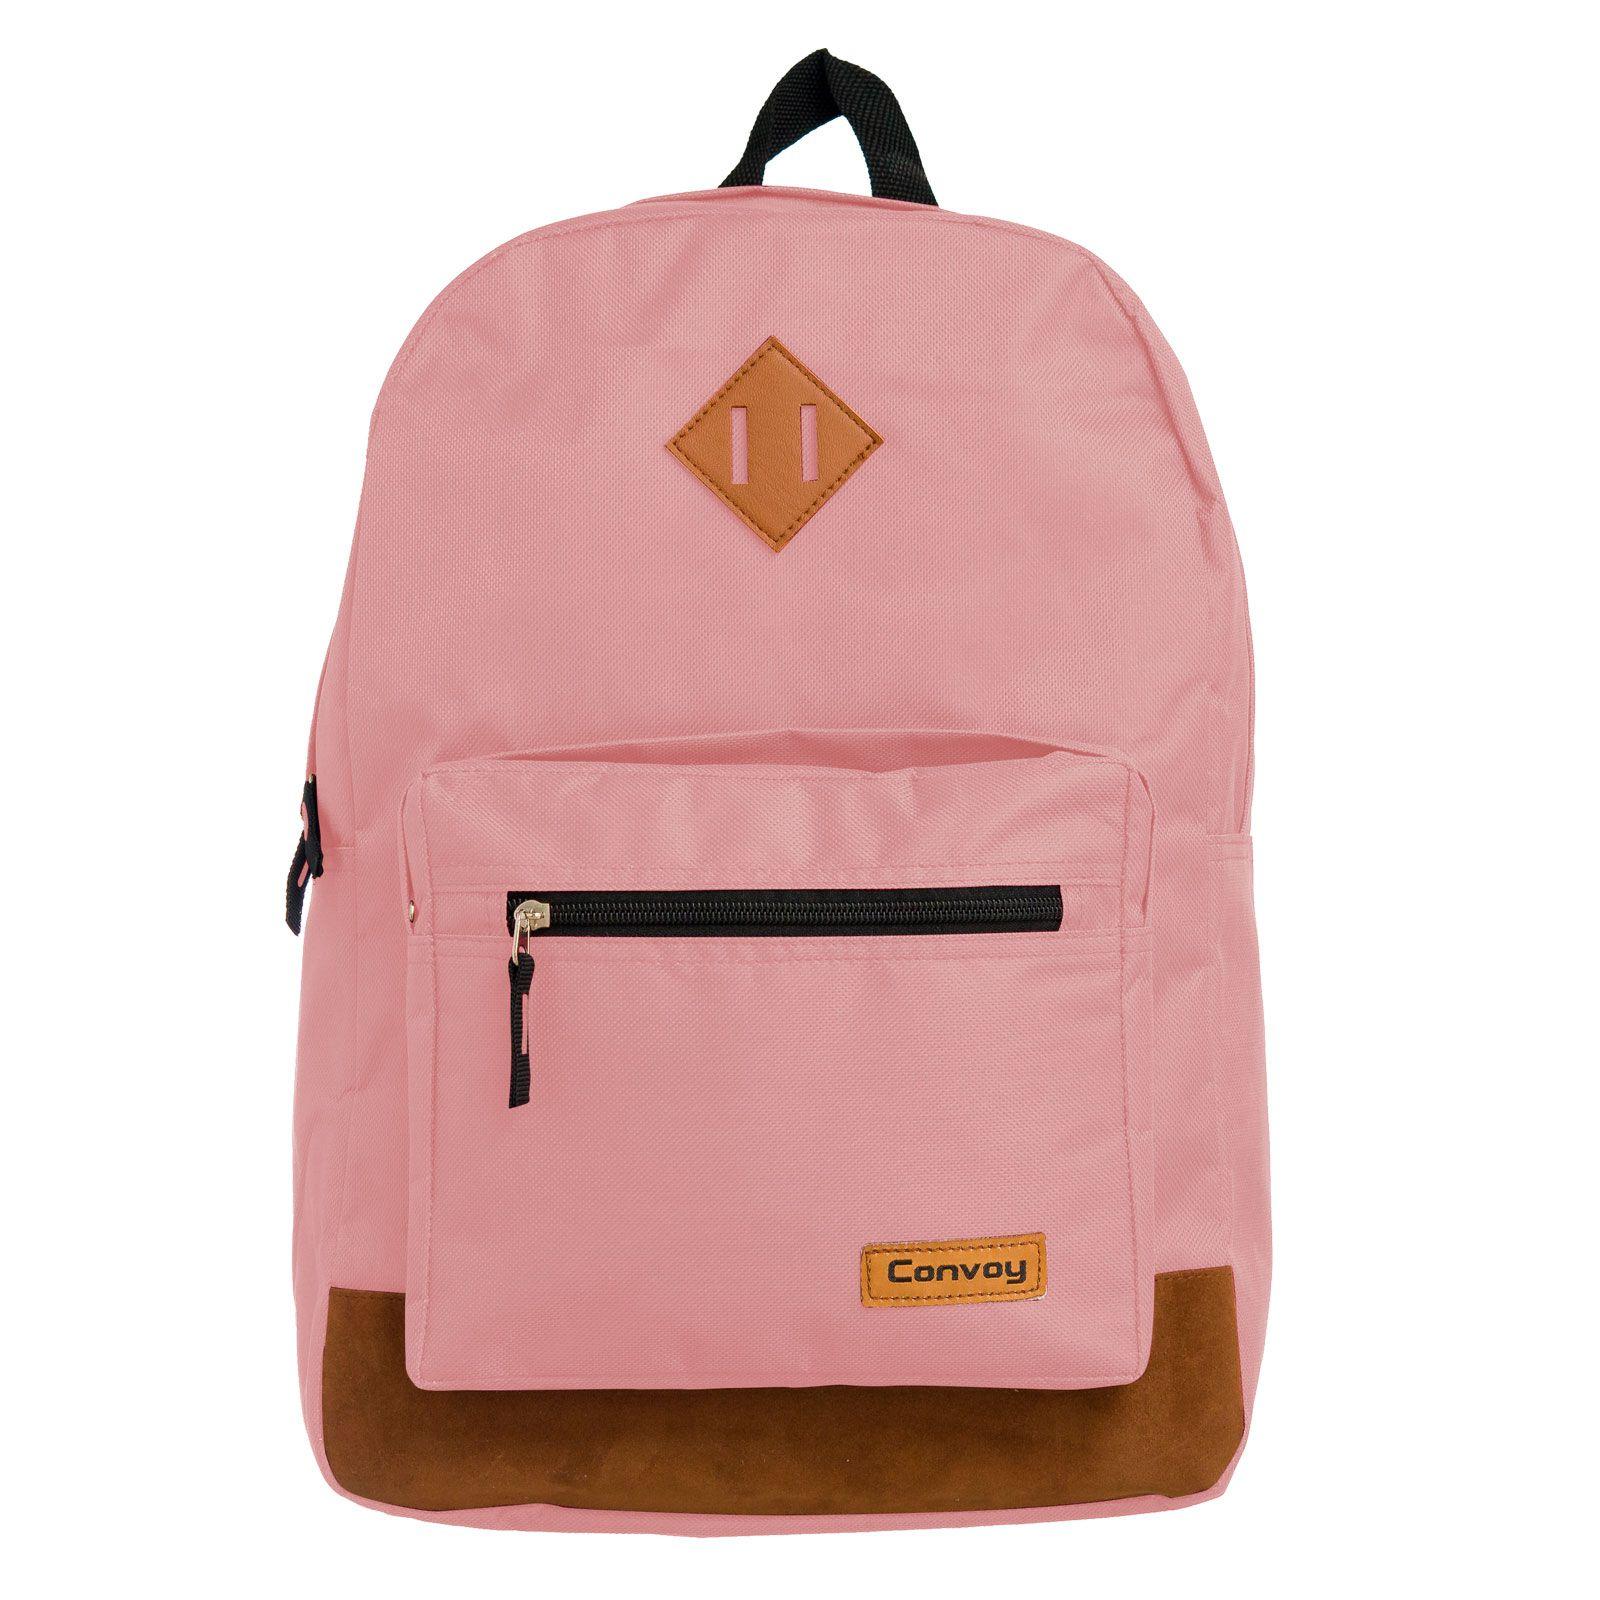 Mochila notebook rosa pastel YS29117 Convoy